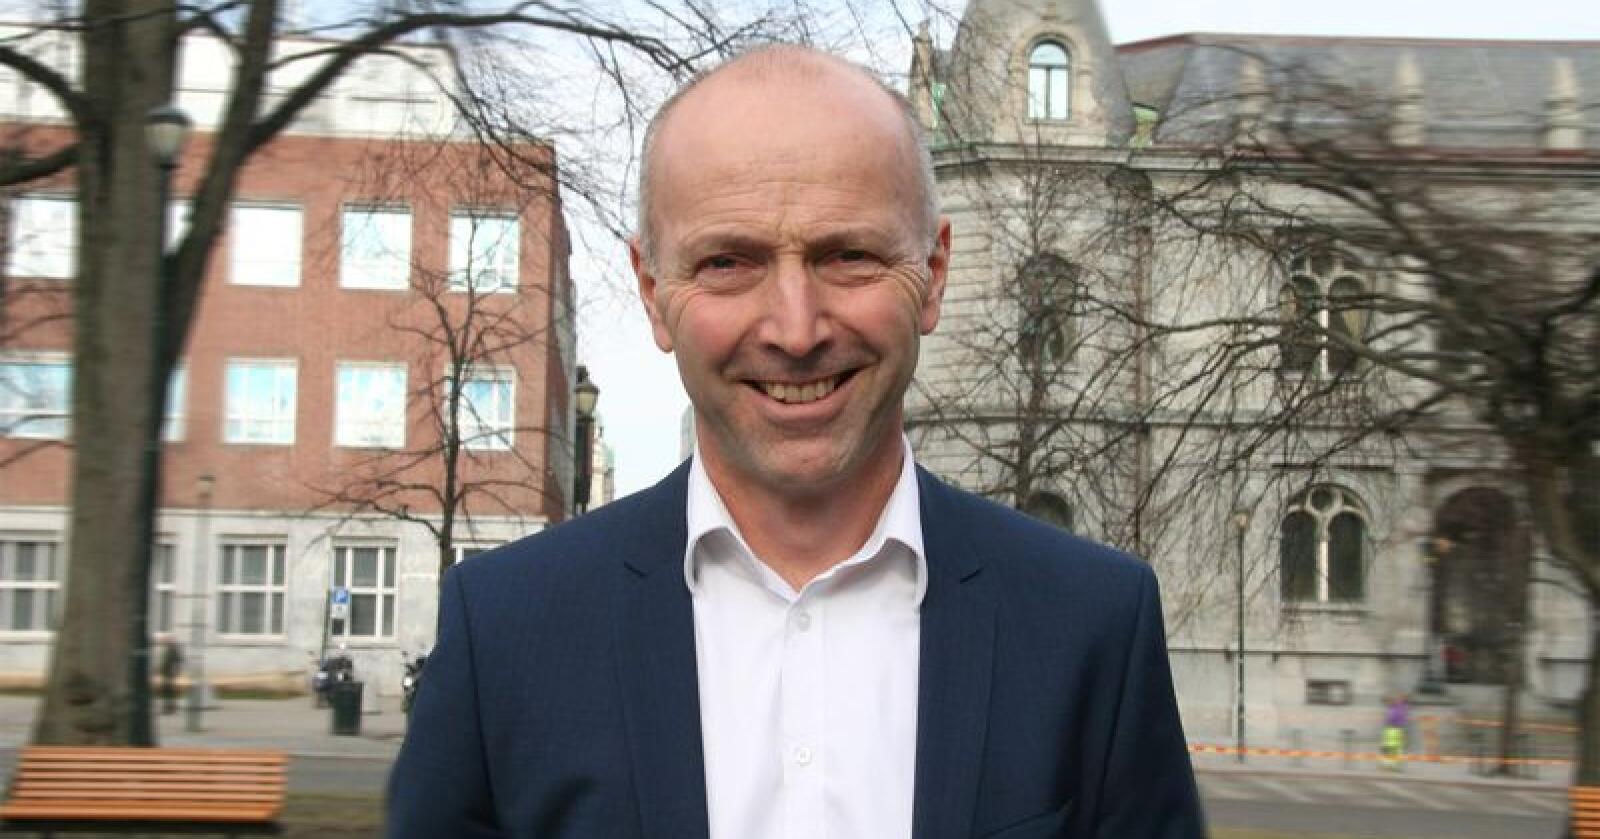 Gunnar Hovland er konsernsjef i Tine. Arkivfoto: Bondebladet